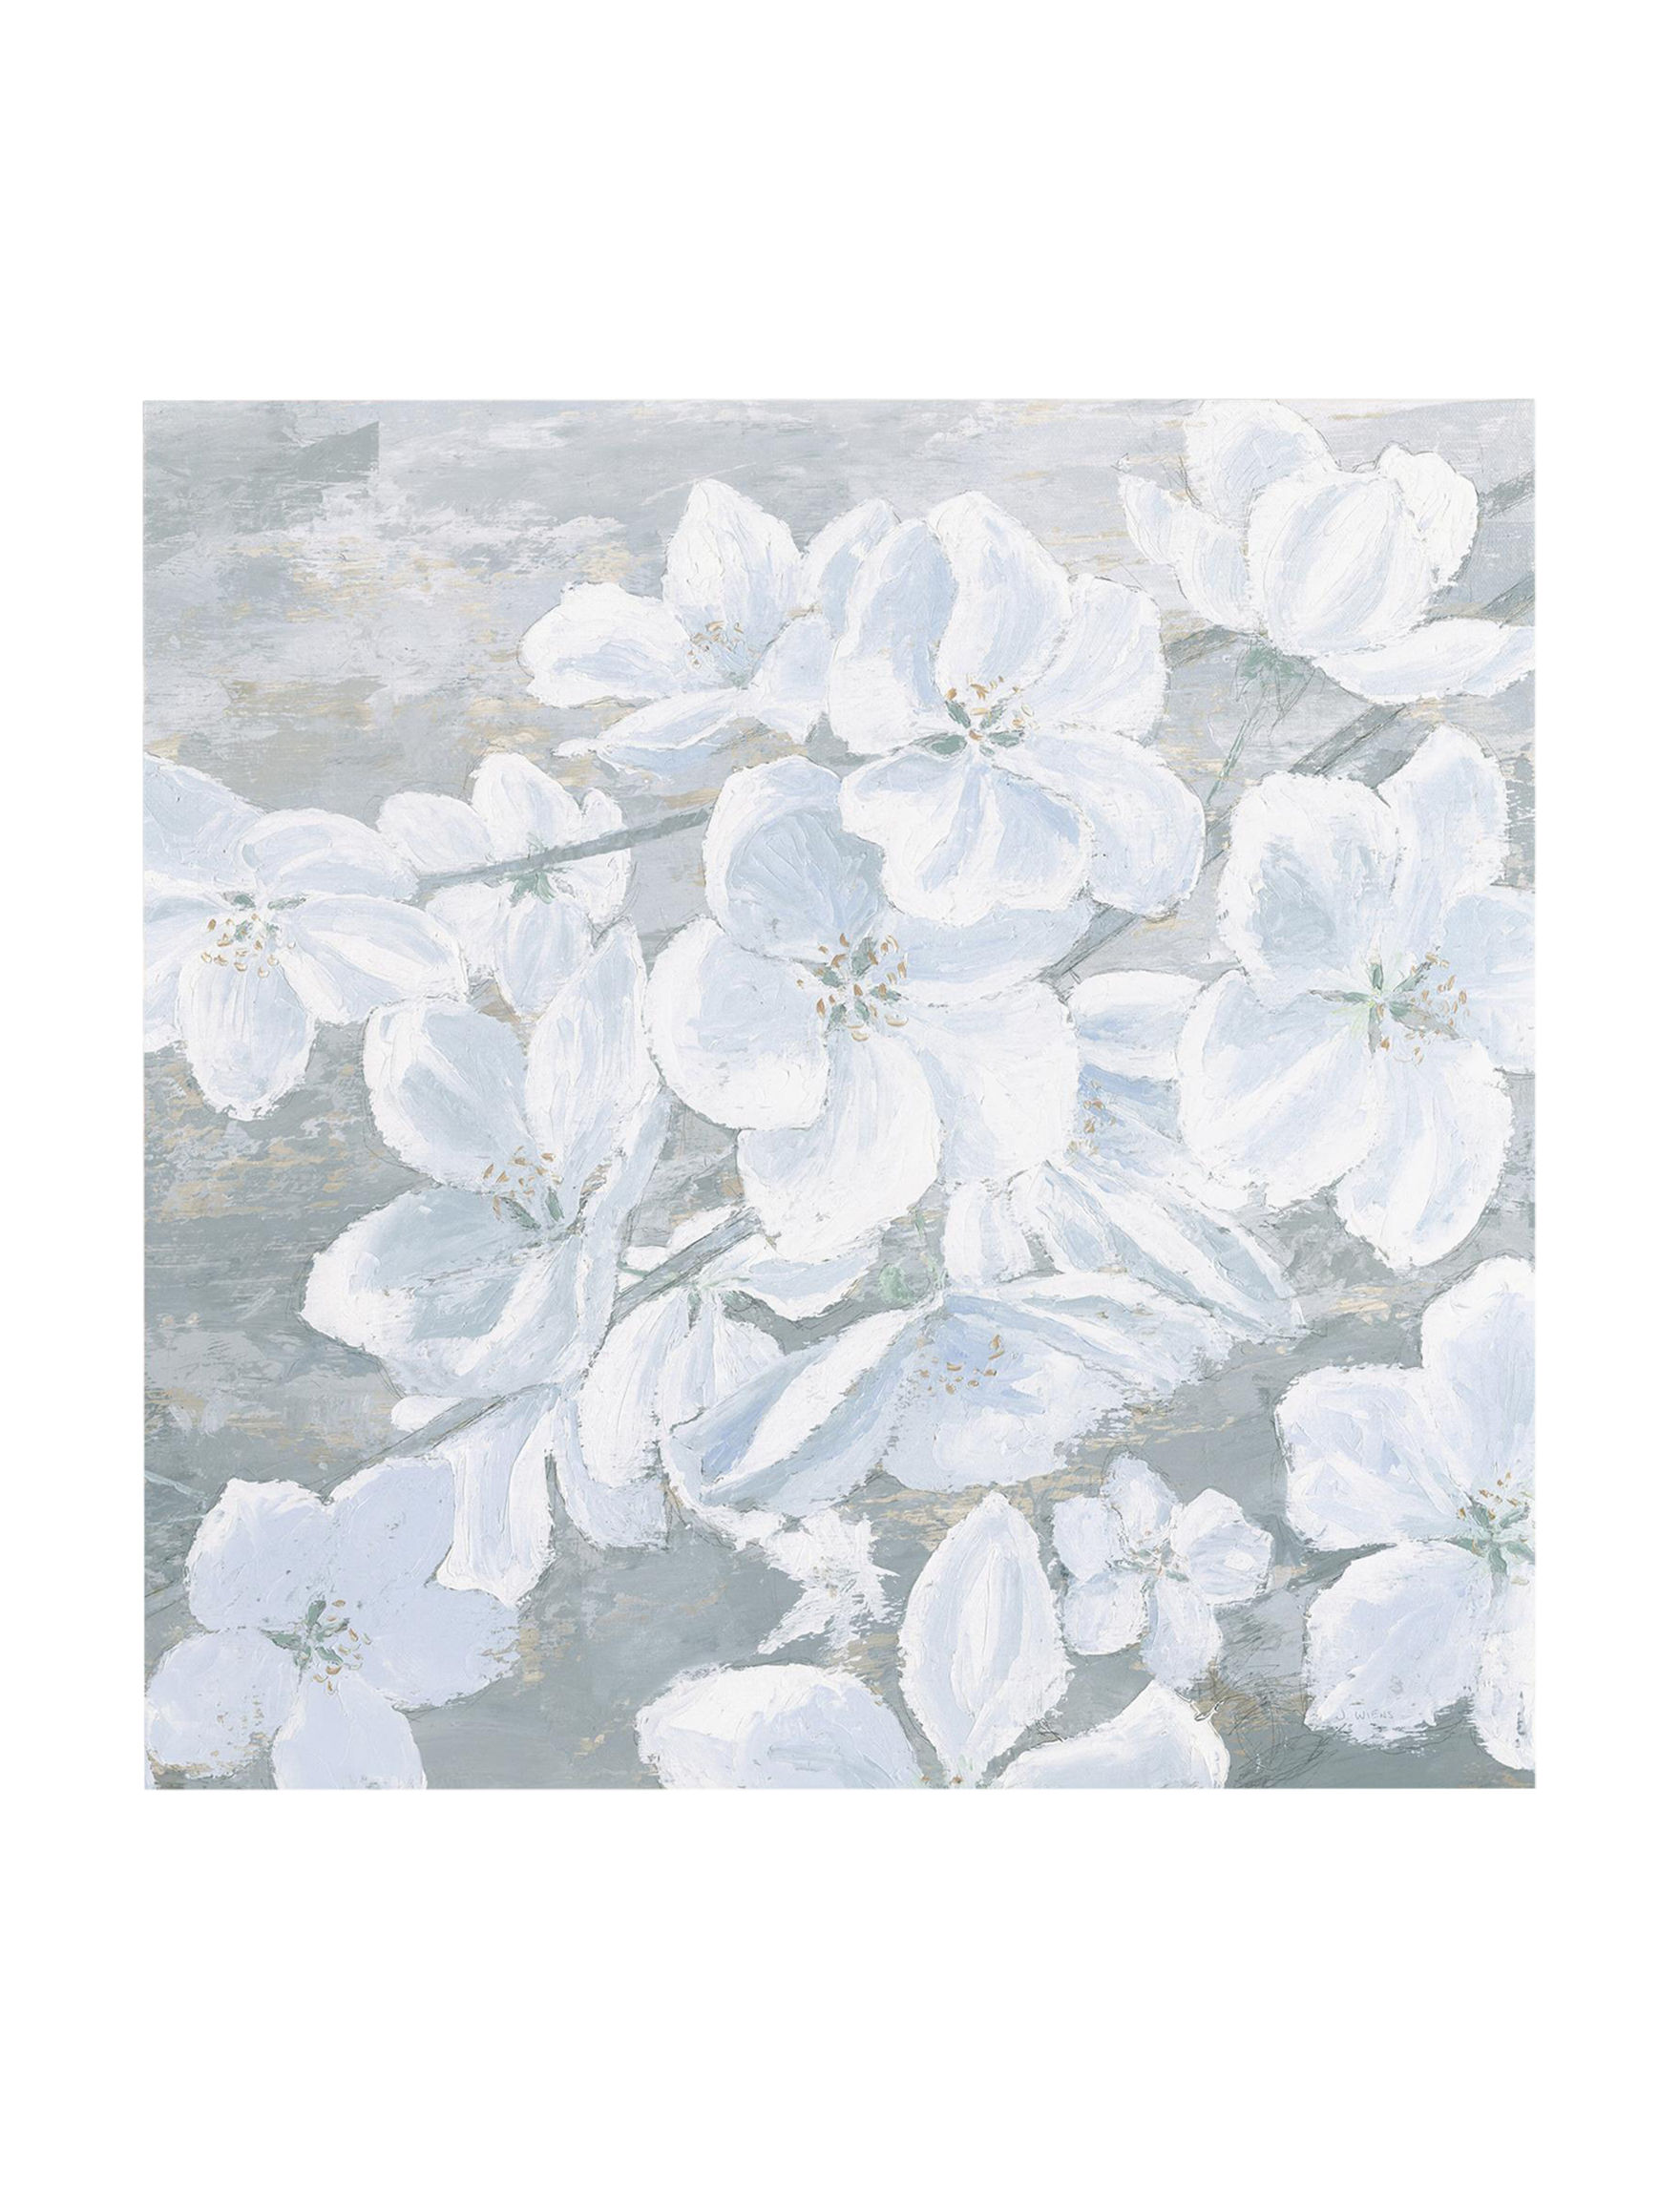 Trademark Fine Art White / Grey Wall Art Home Accents Wall Decor